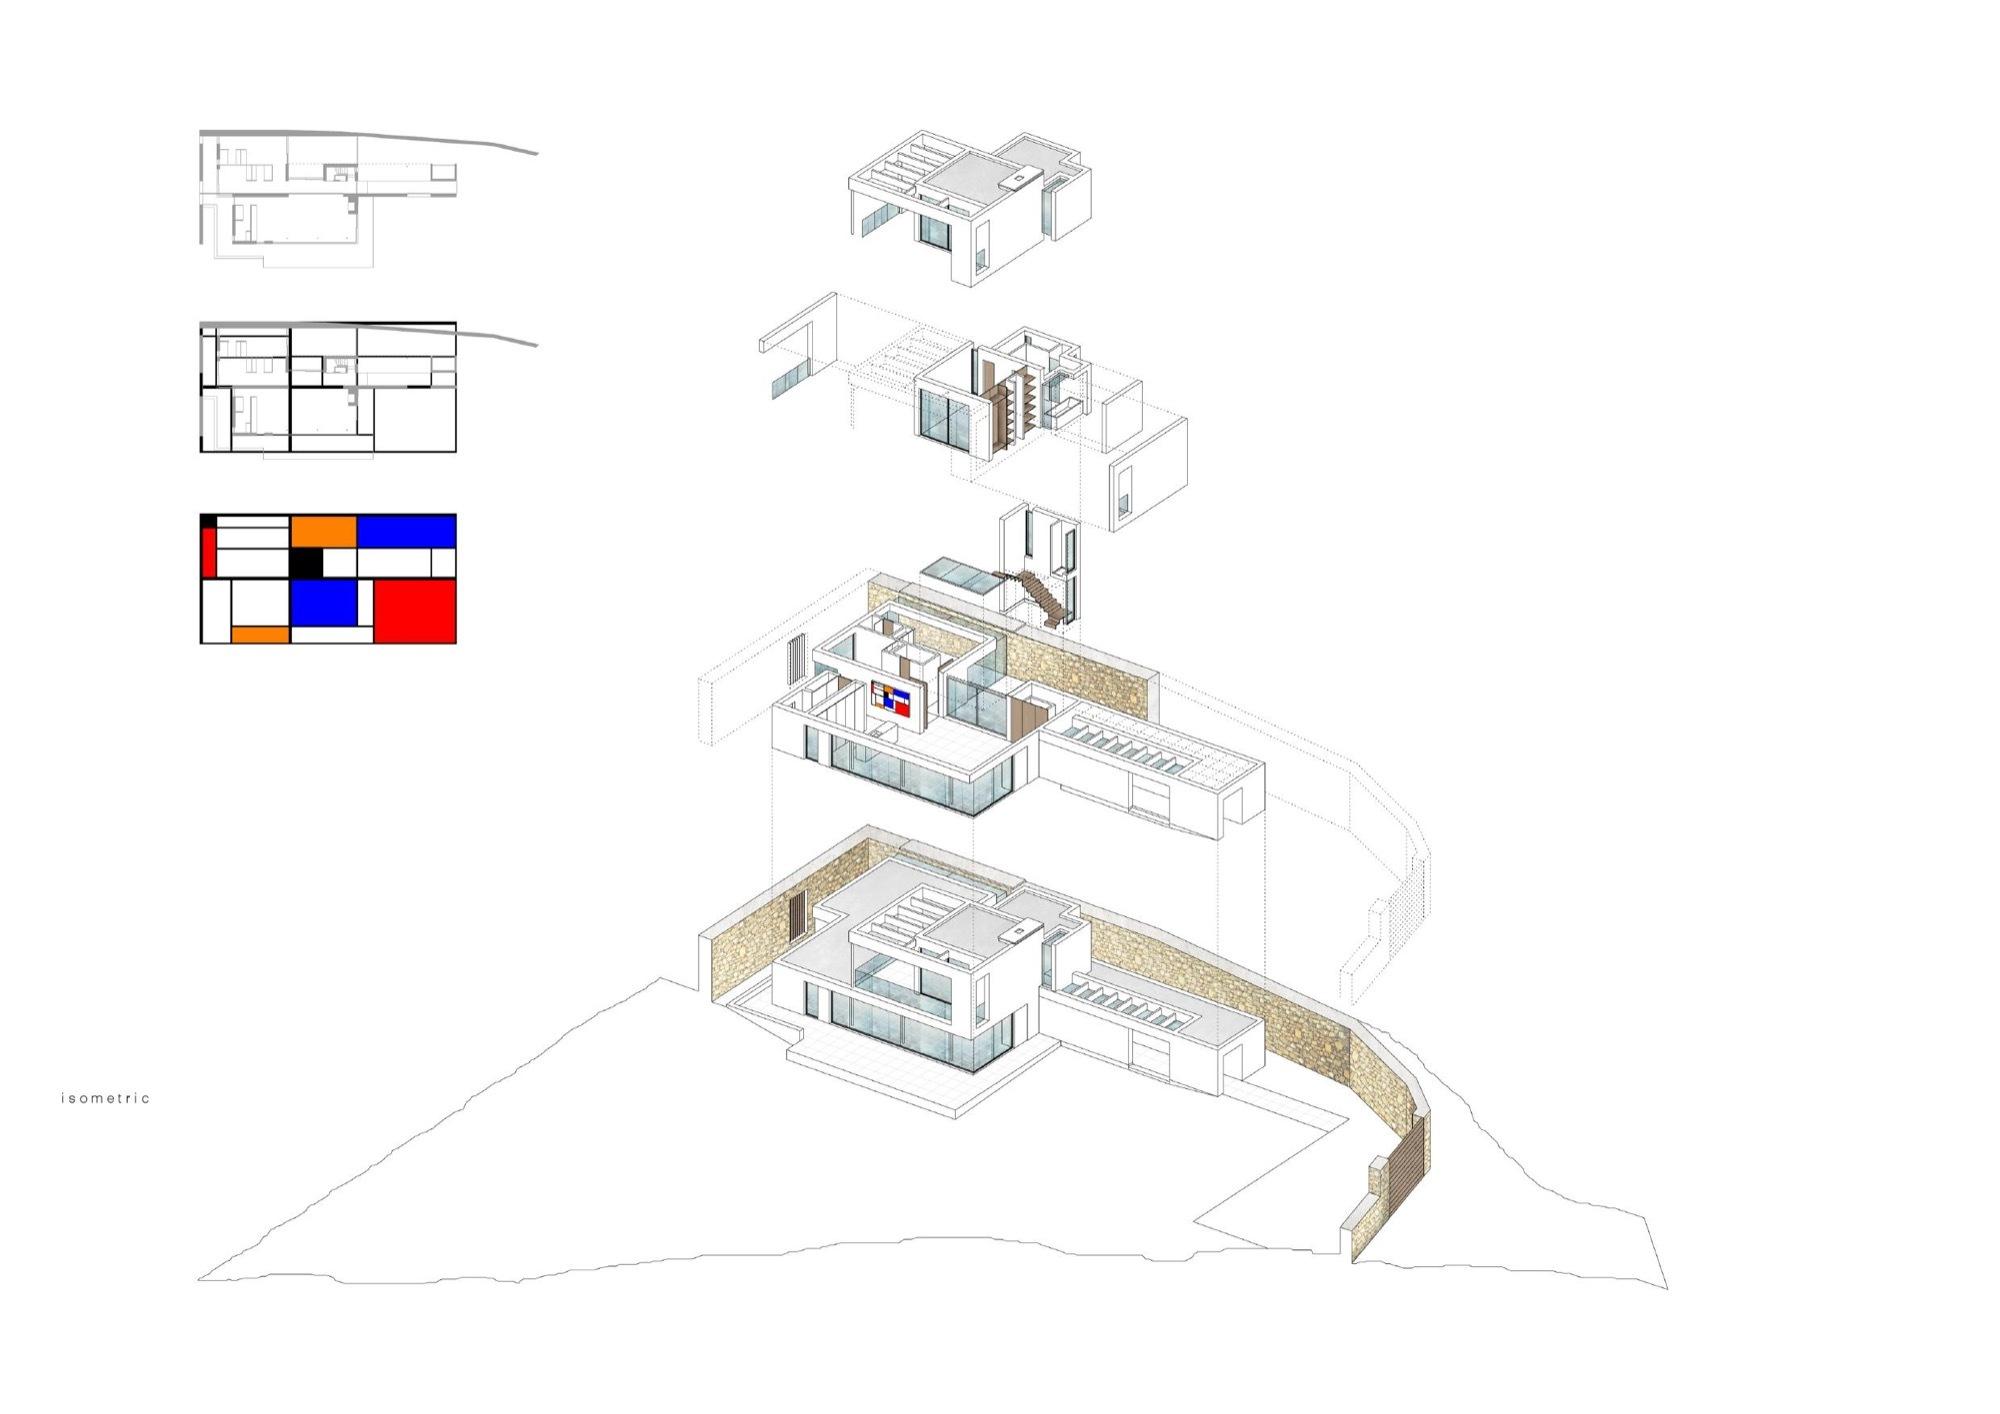 Cefn Castell / stephenson STUDIO | ArchDaily